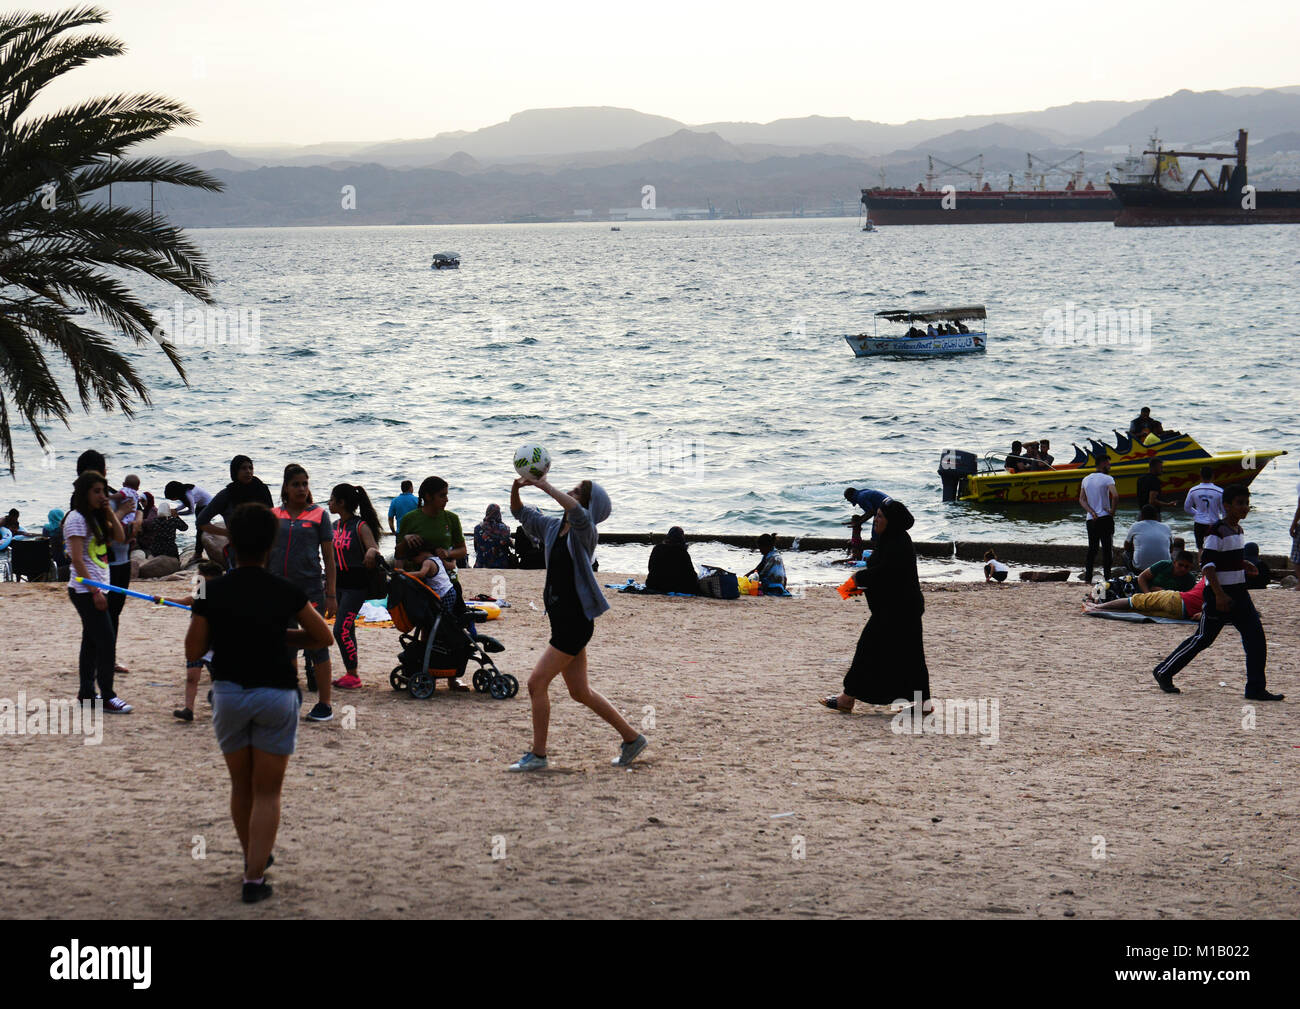 Jordanian girls playing beach volleyball  on Al-Ghandour Beach in Aqaba, Jordan. - Stock Image